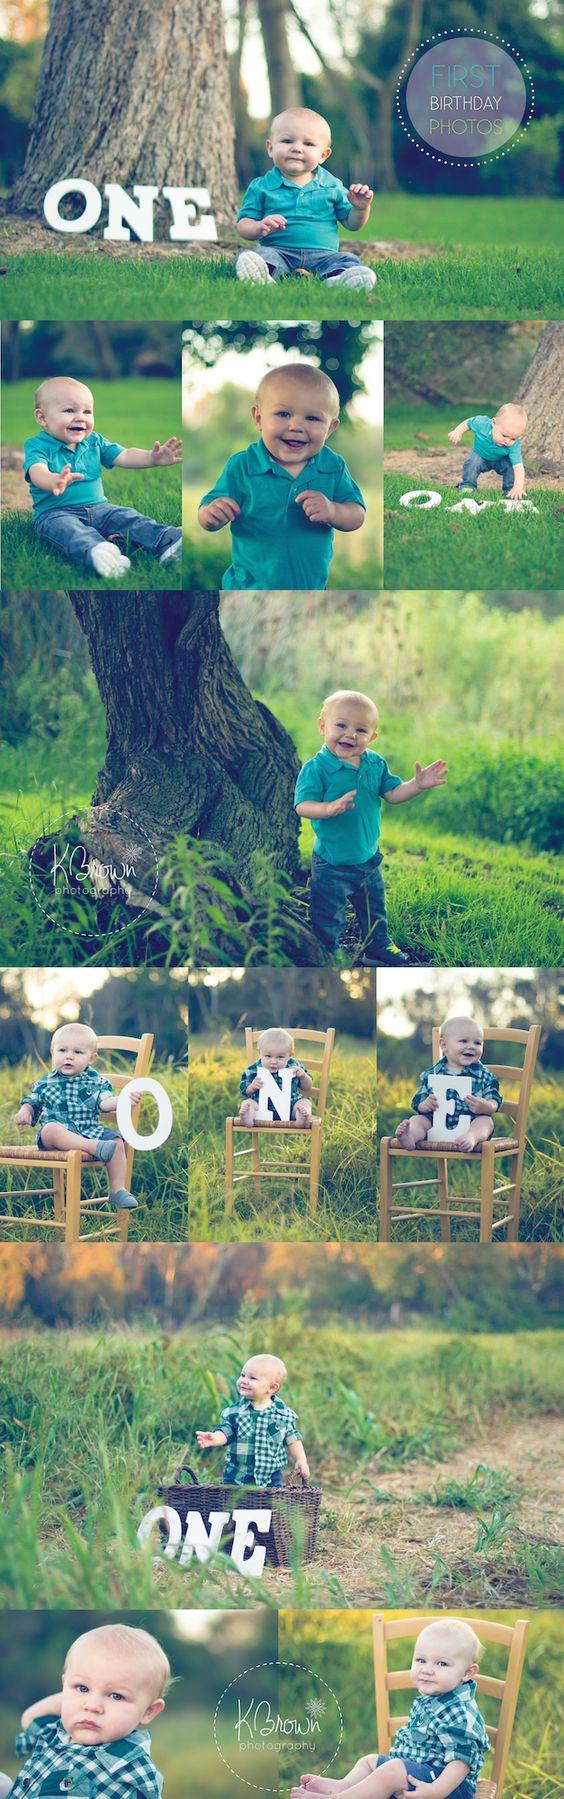 O N E Year Old. | Pinterest | Birthday photos, Birthdays ... First Photograph Date